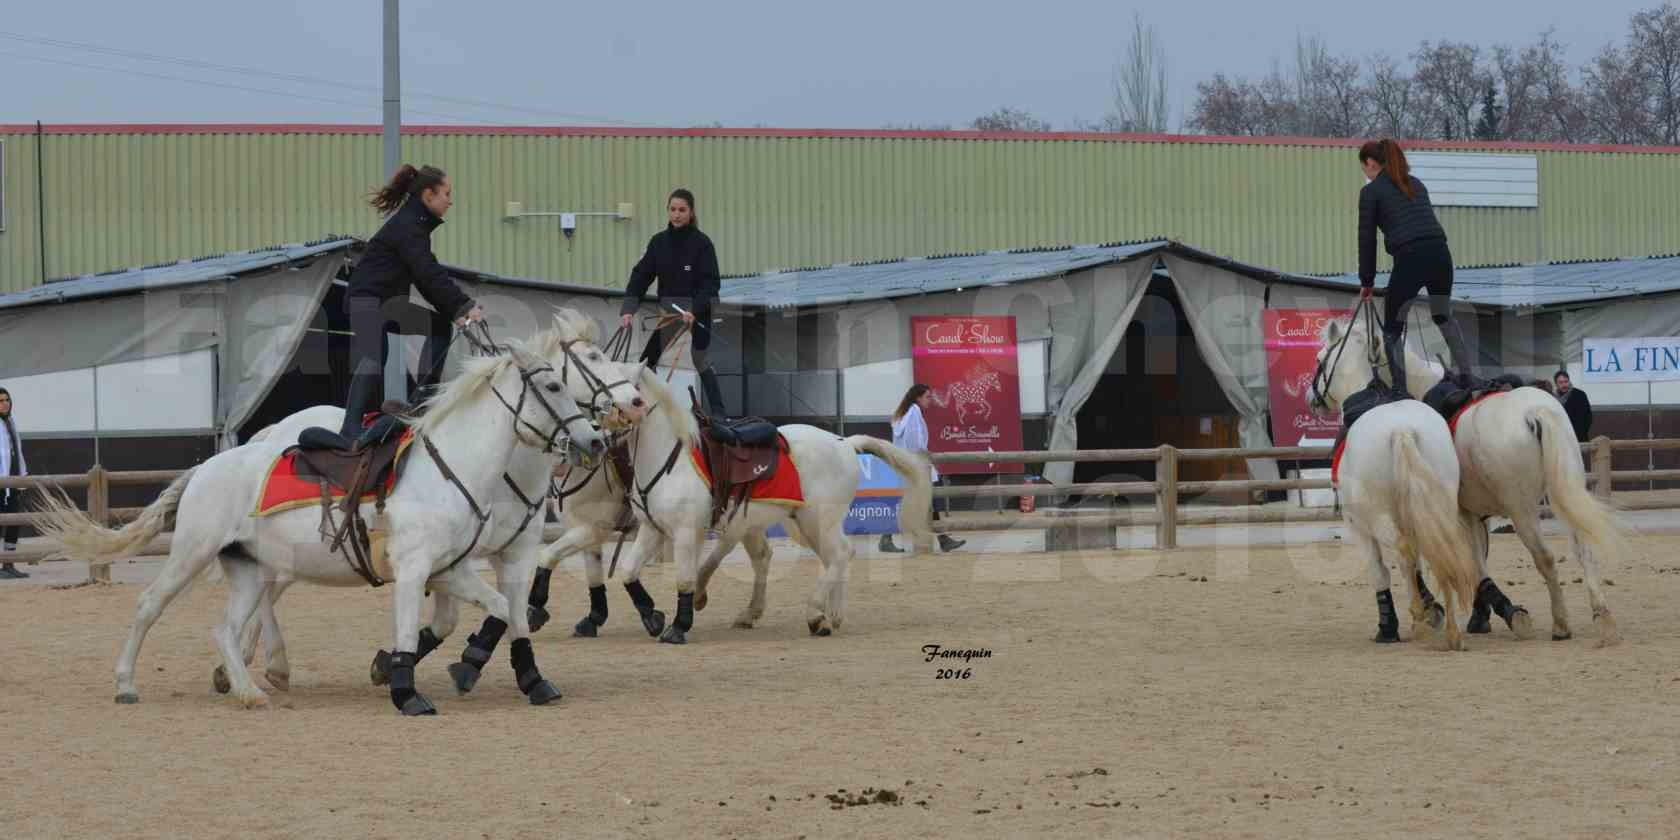 Cheval Passion 2016 - CAMARGUE poste hongroise - 4